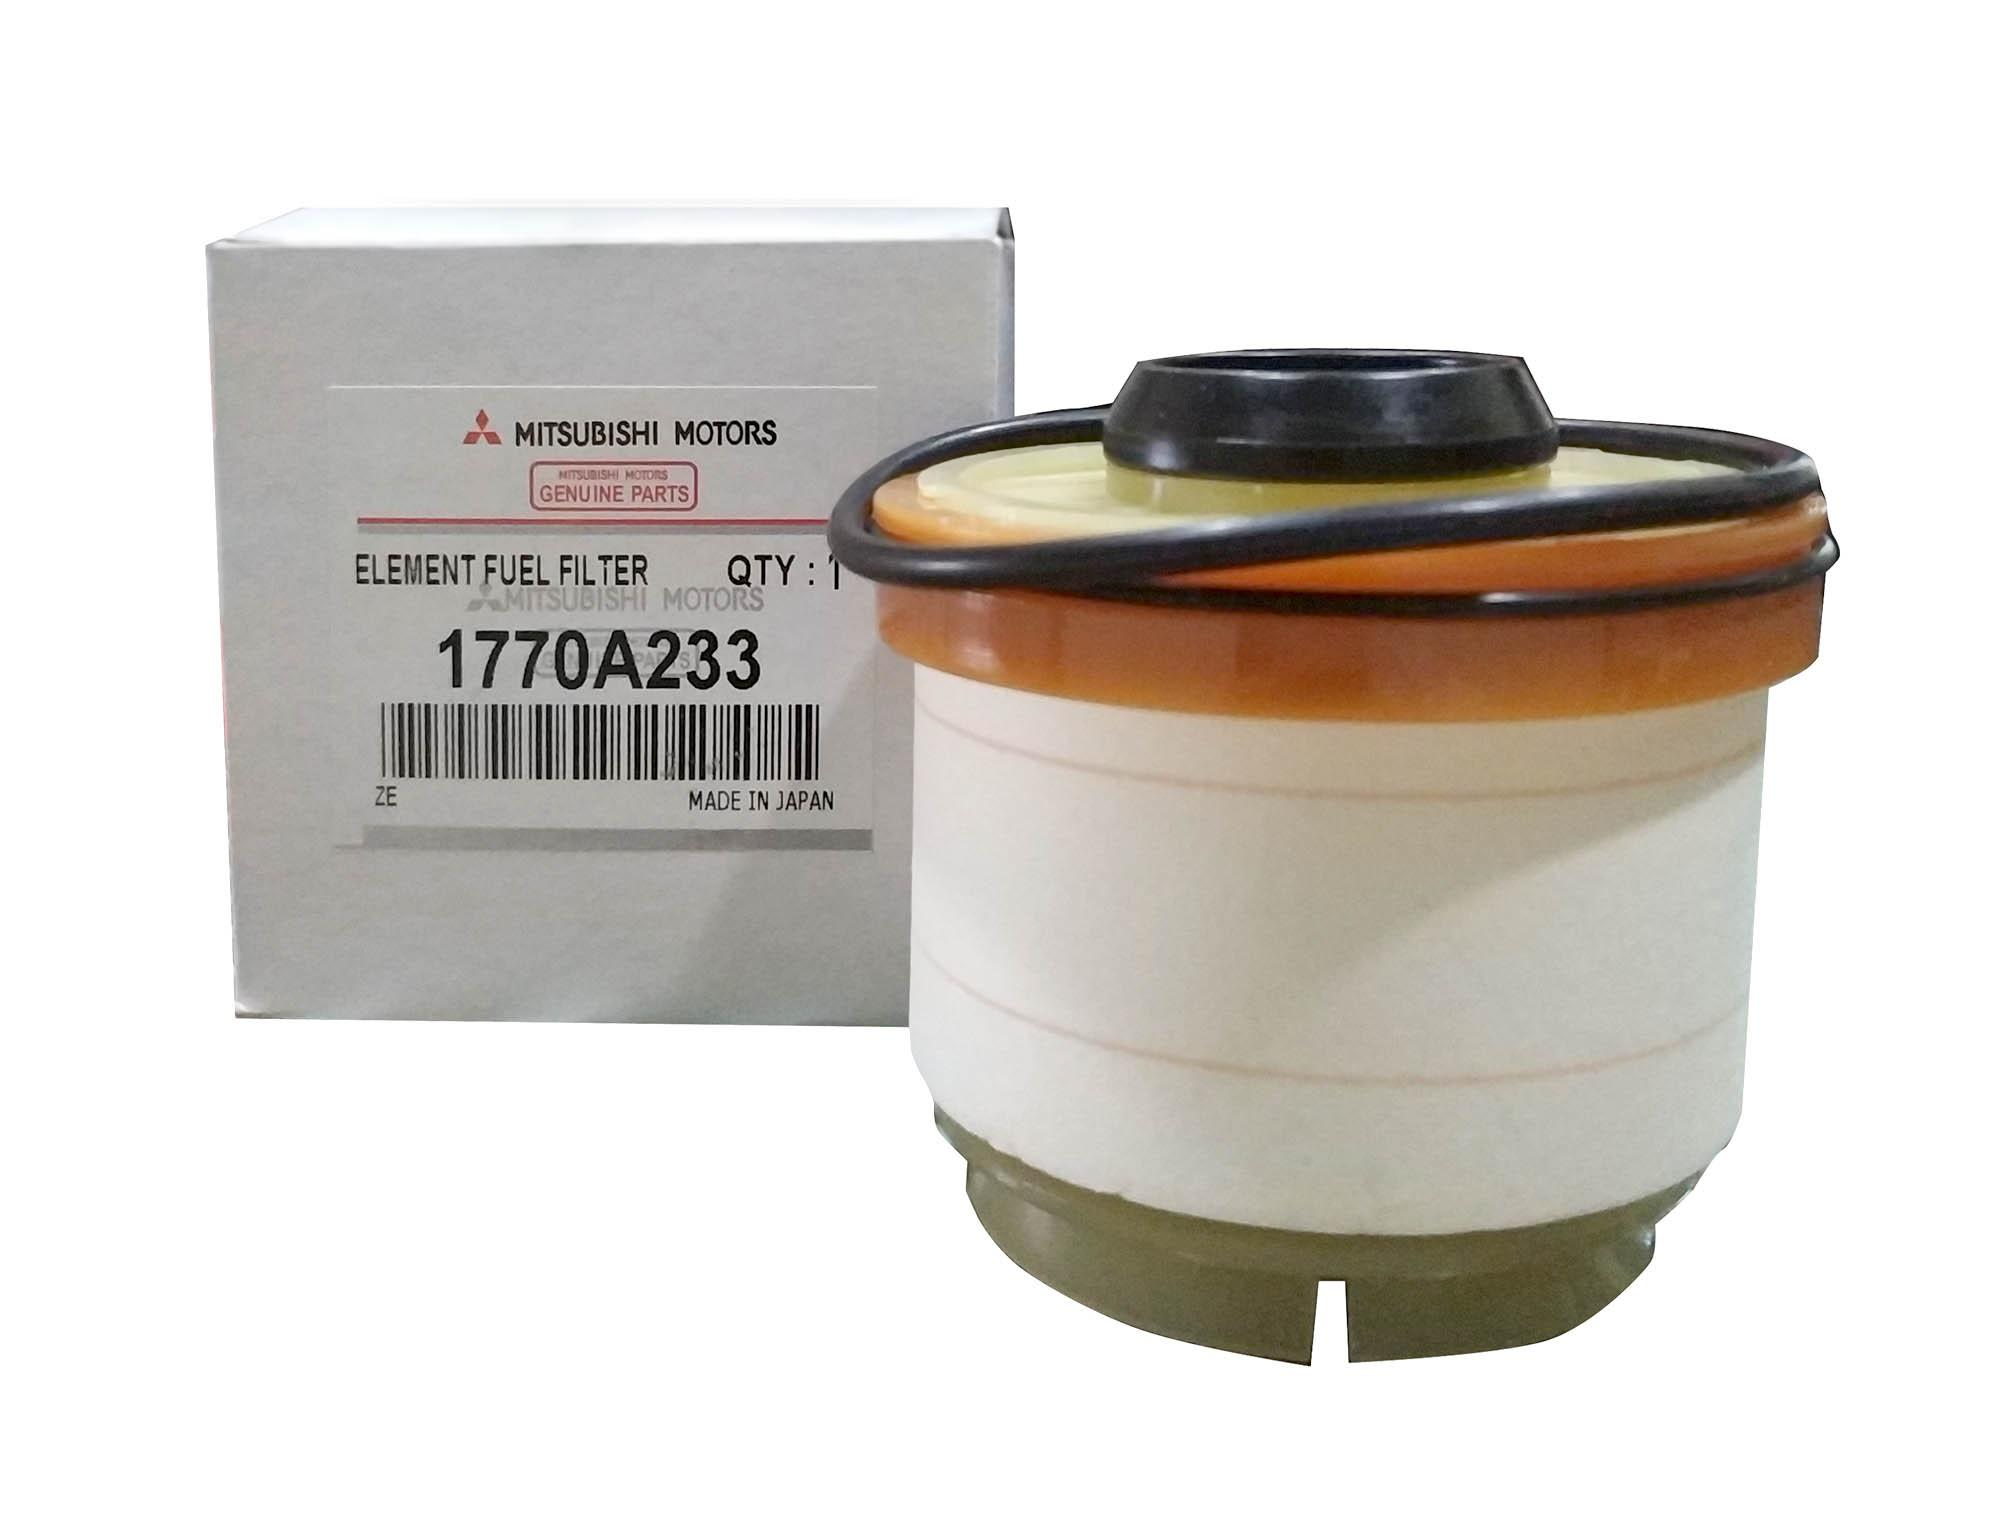 Mitsubishi Motors Genuine Fuel Filter Part No  1770A233 For Mitsubishi  Montero 2012 to 2018 ( Gen 2 and Gen 3 )